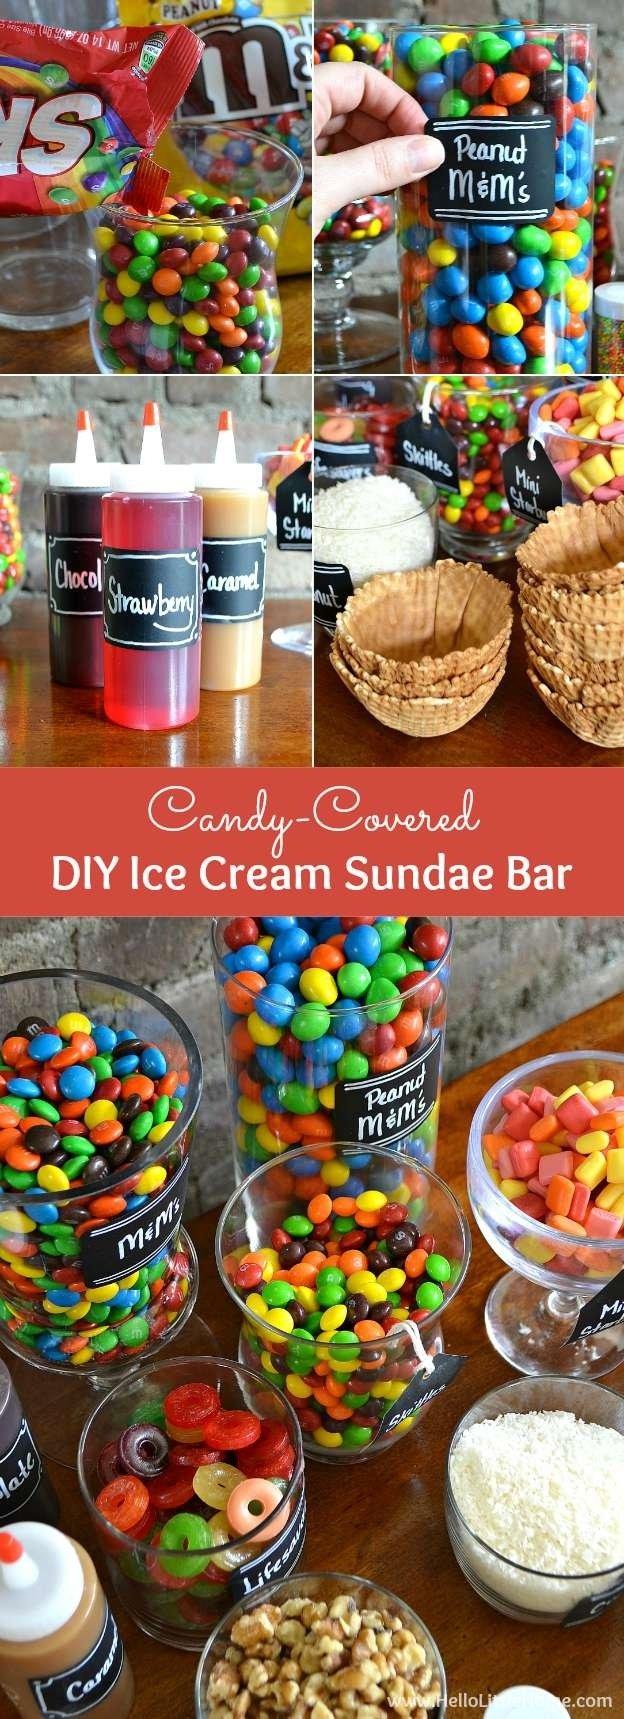 10 Beautiful Ice Cream Sundae Bar Ideas diy ice cream sundae bar tips toppings more hello little home 2020